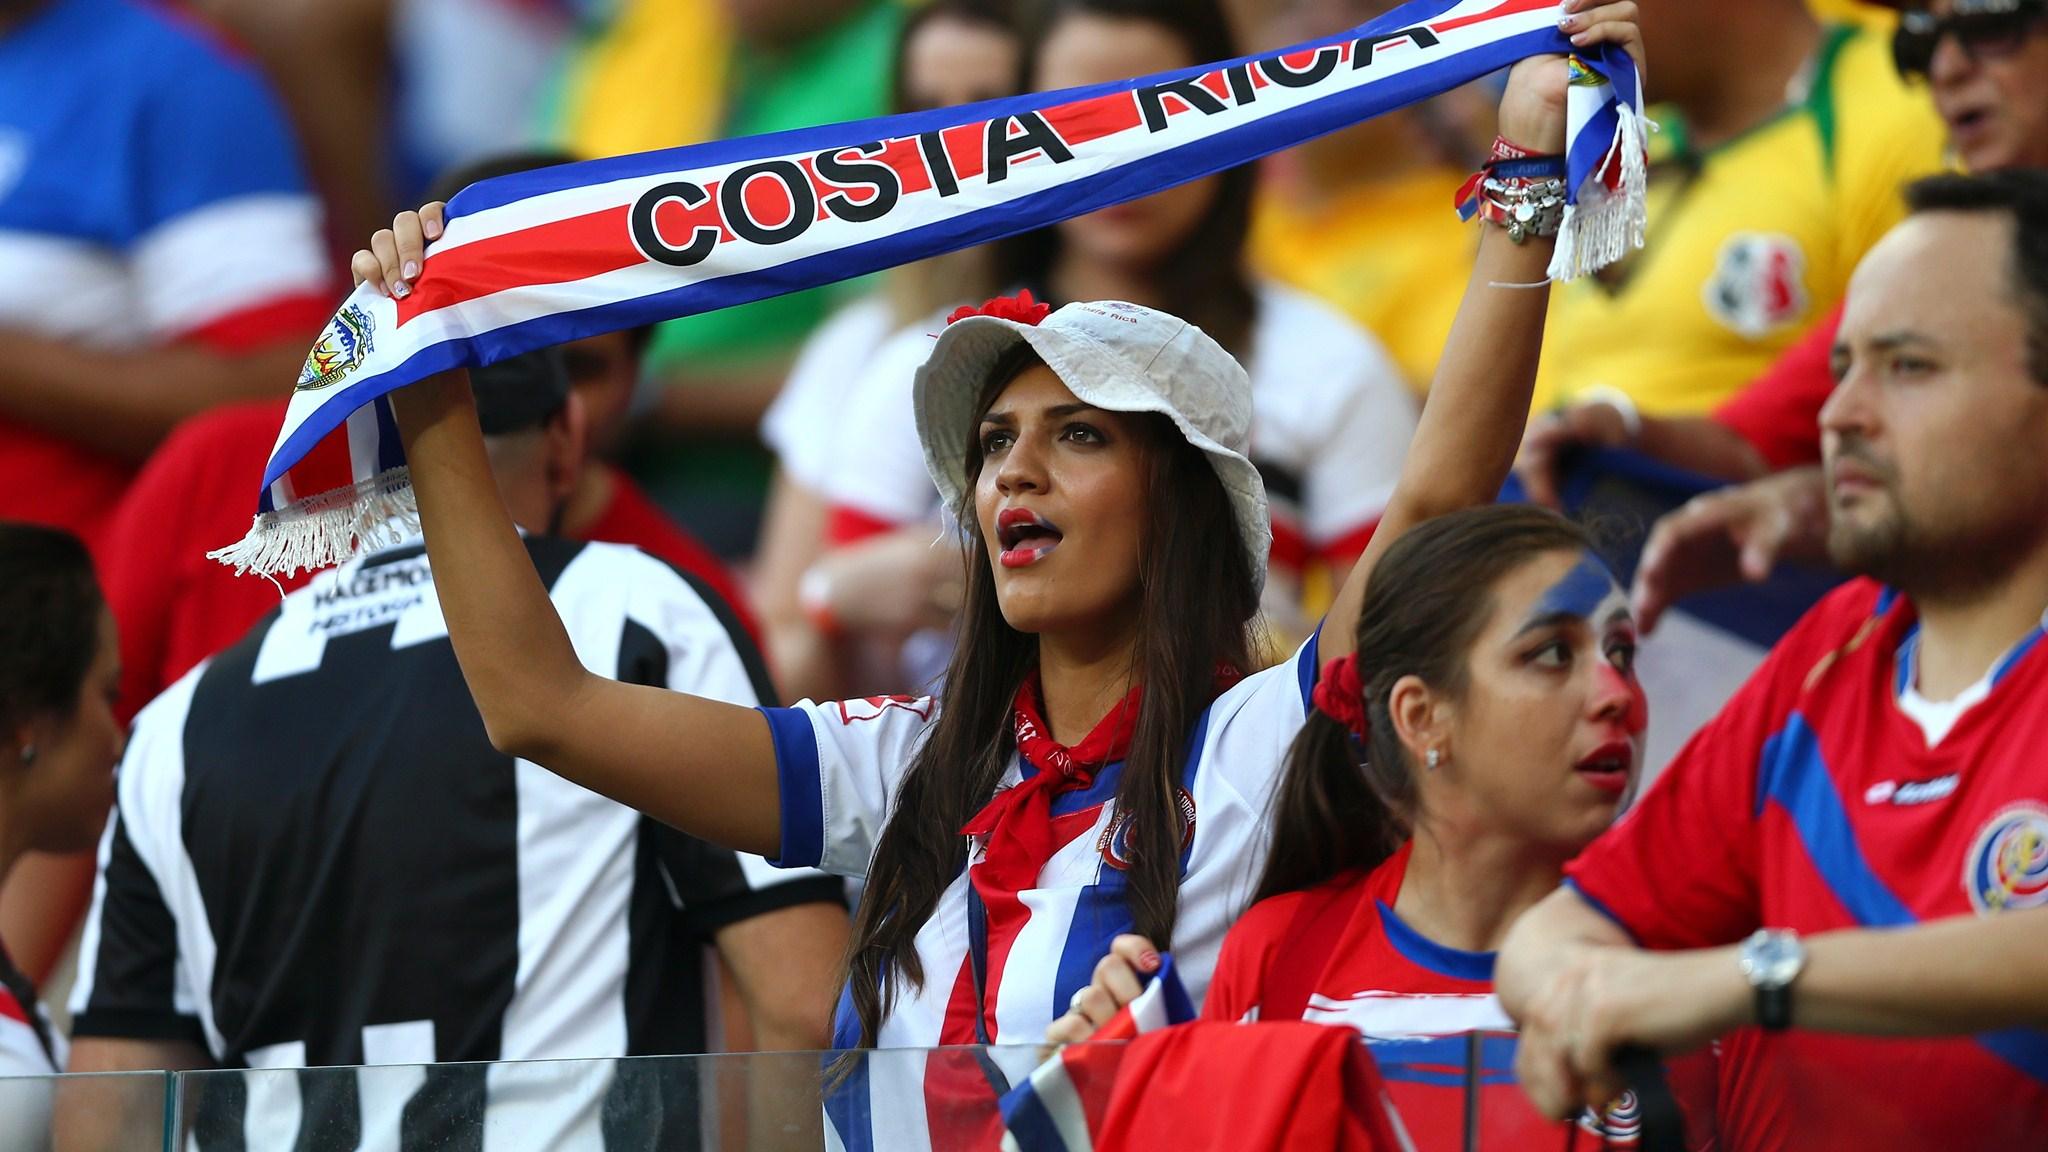 168 - Costa Rica-Greece [1-1 - Costa Rica win on penalties (5 - 3)] -- 29 Jun 2014 - 17-00